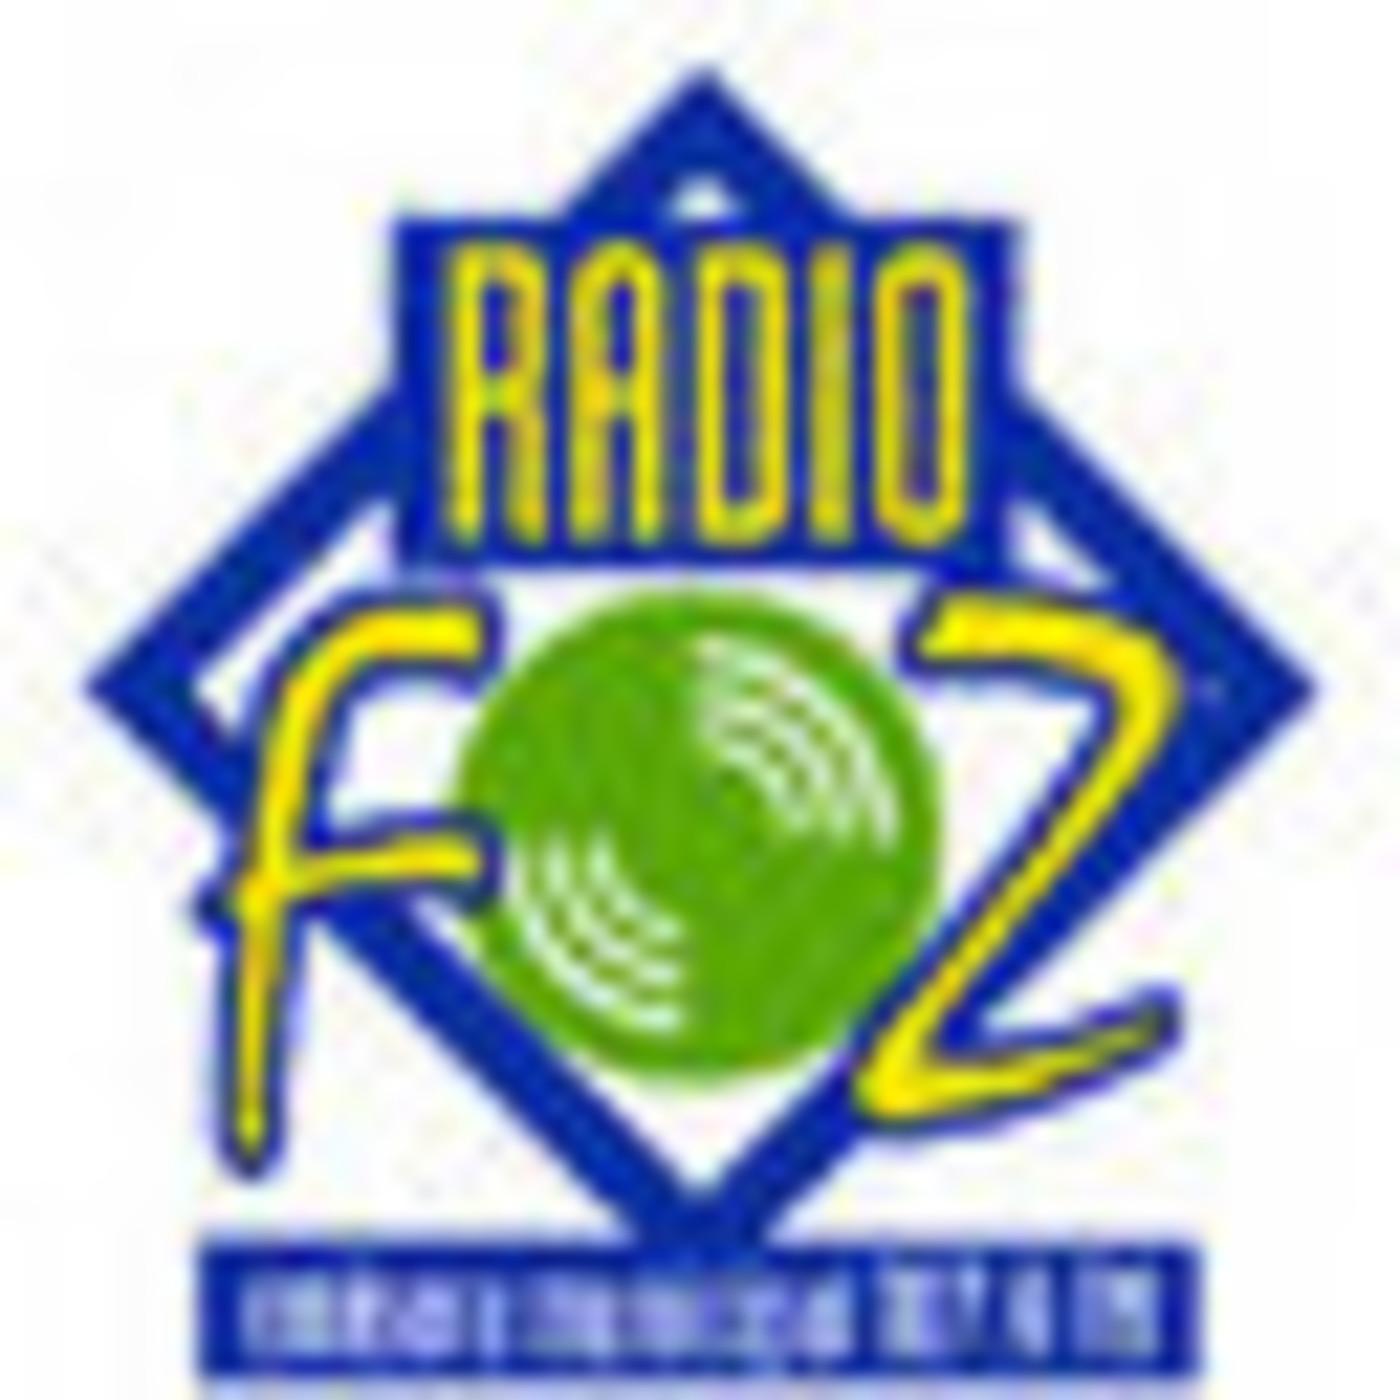 Radio Foz (Lugo - Galicia - Spain)